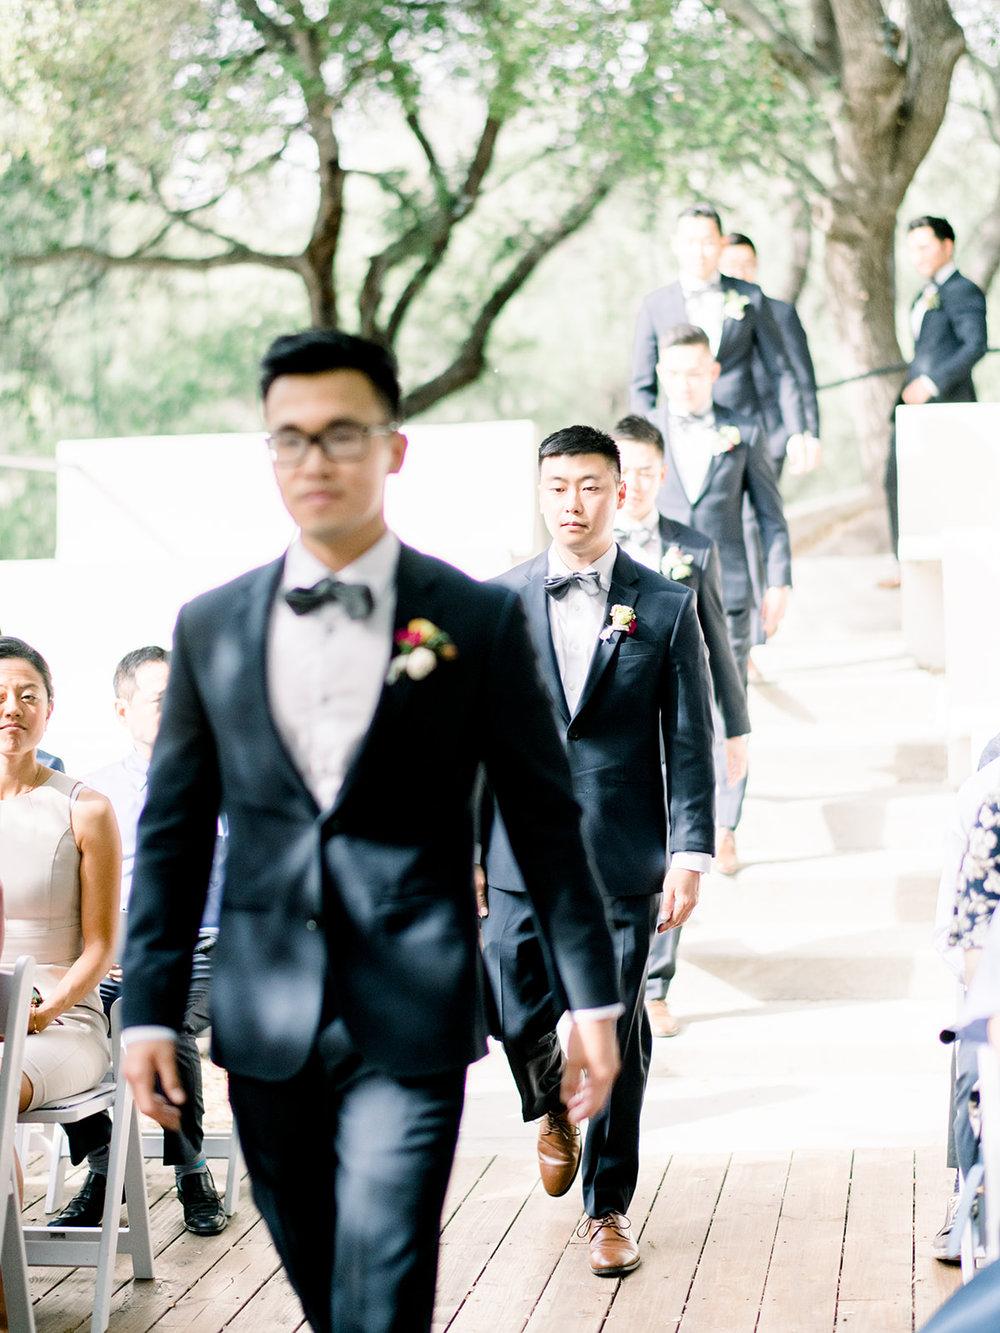 jueunandjon-etherandsmith-wedding-656.jpg